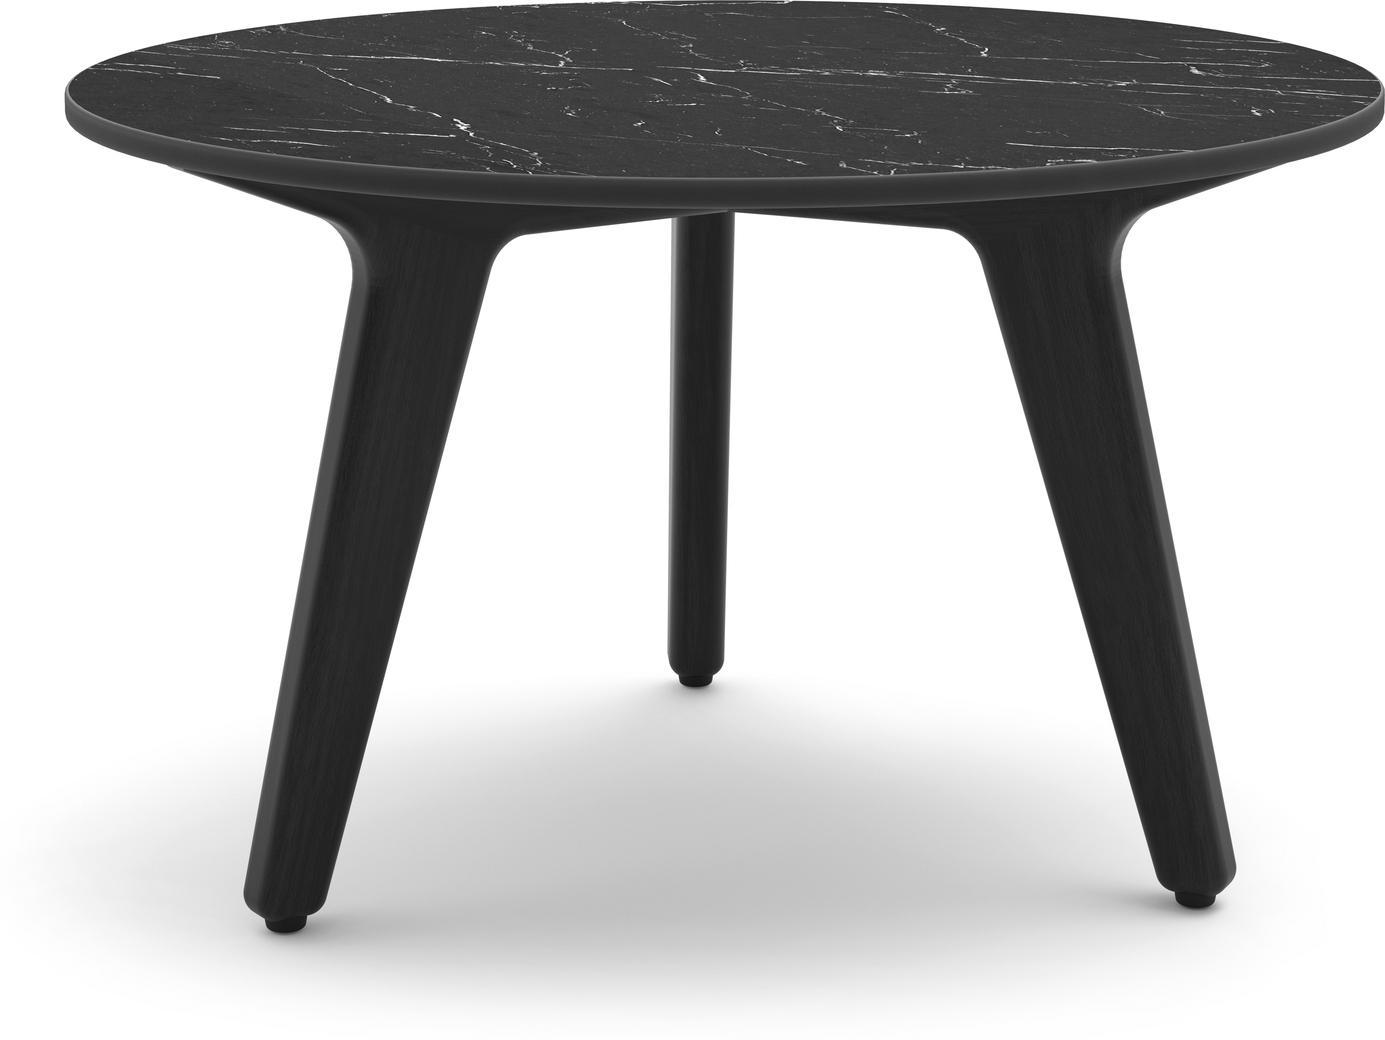 Table basse Torsa 60 - Teck noir - 5K59